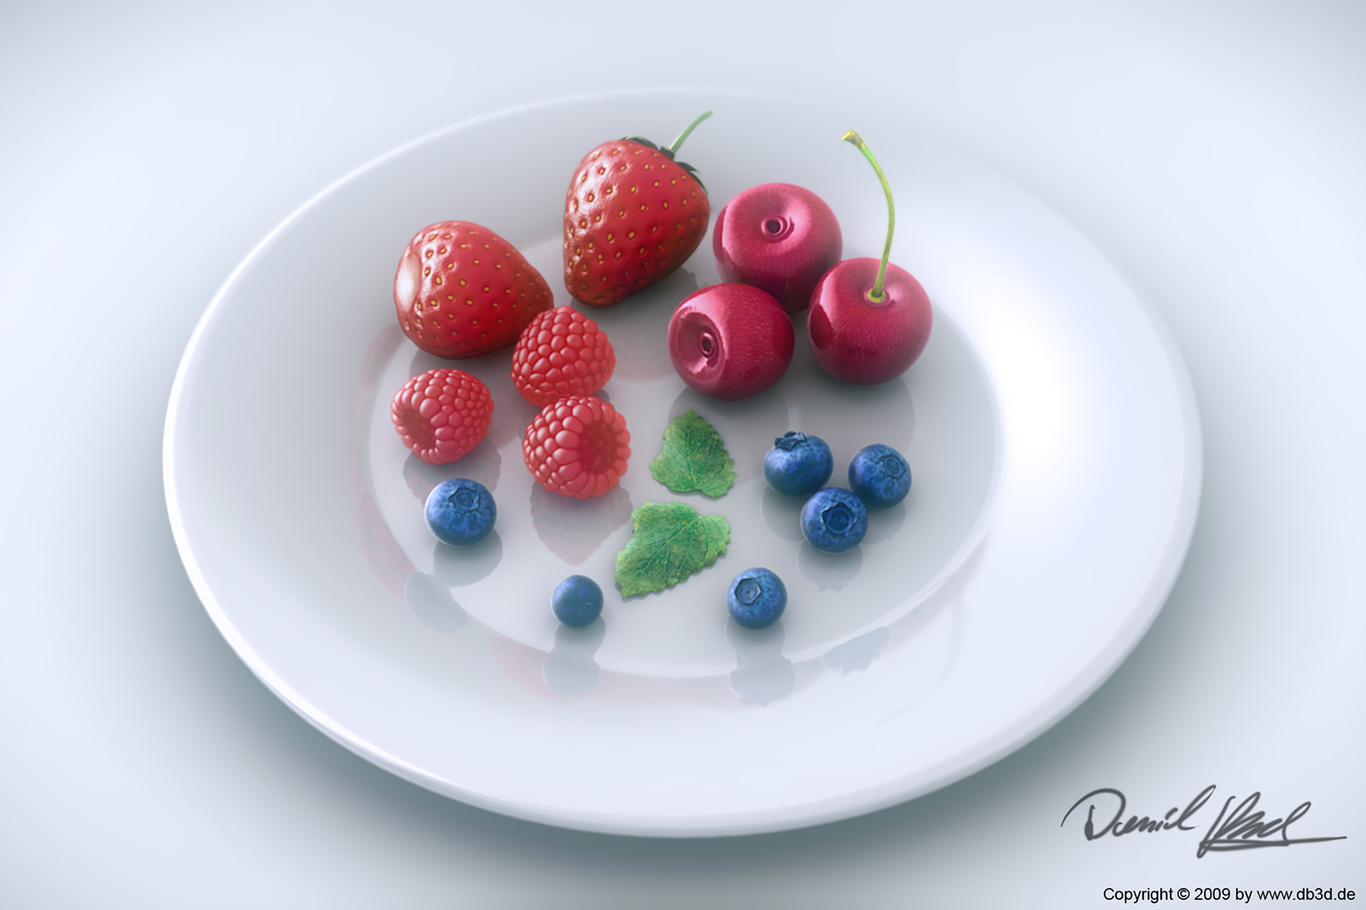 Freebug fruits time 1 bd79d373 1sq6